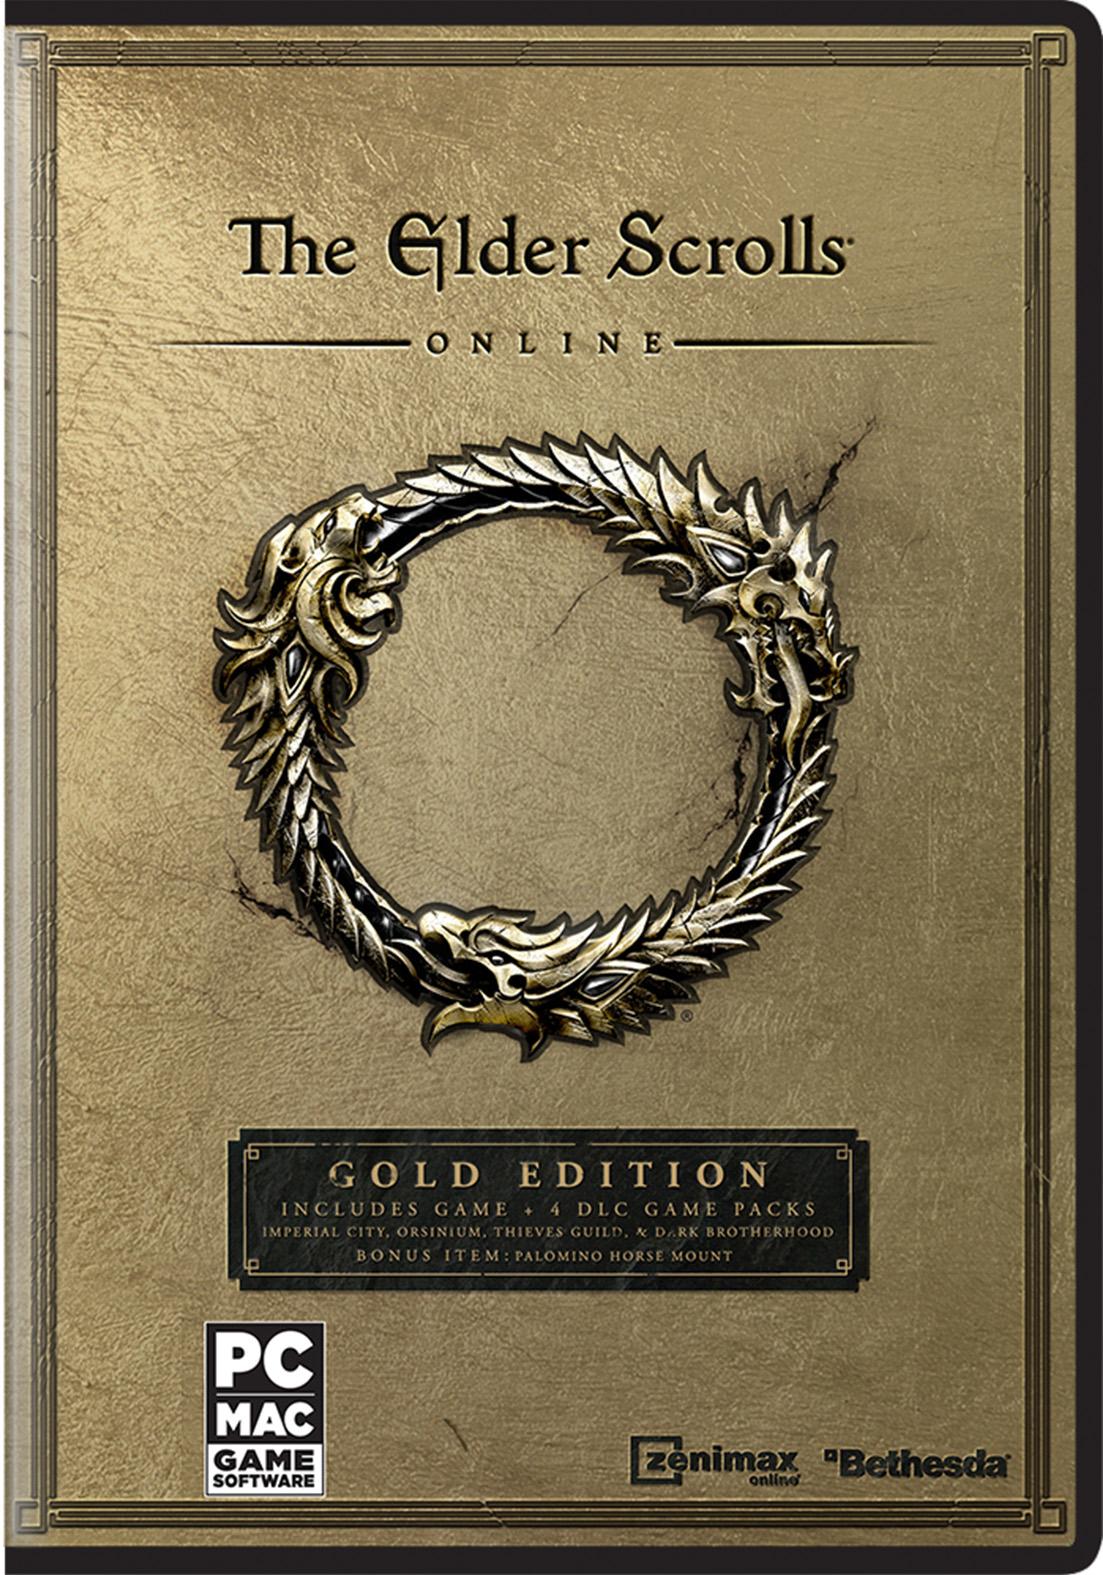 Buy The Elder Scrolls Online: Gold Edition PC Game - Microsoft Store en-CA